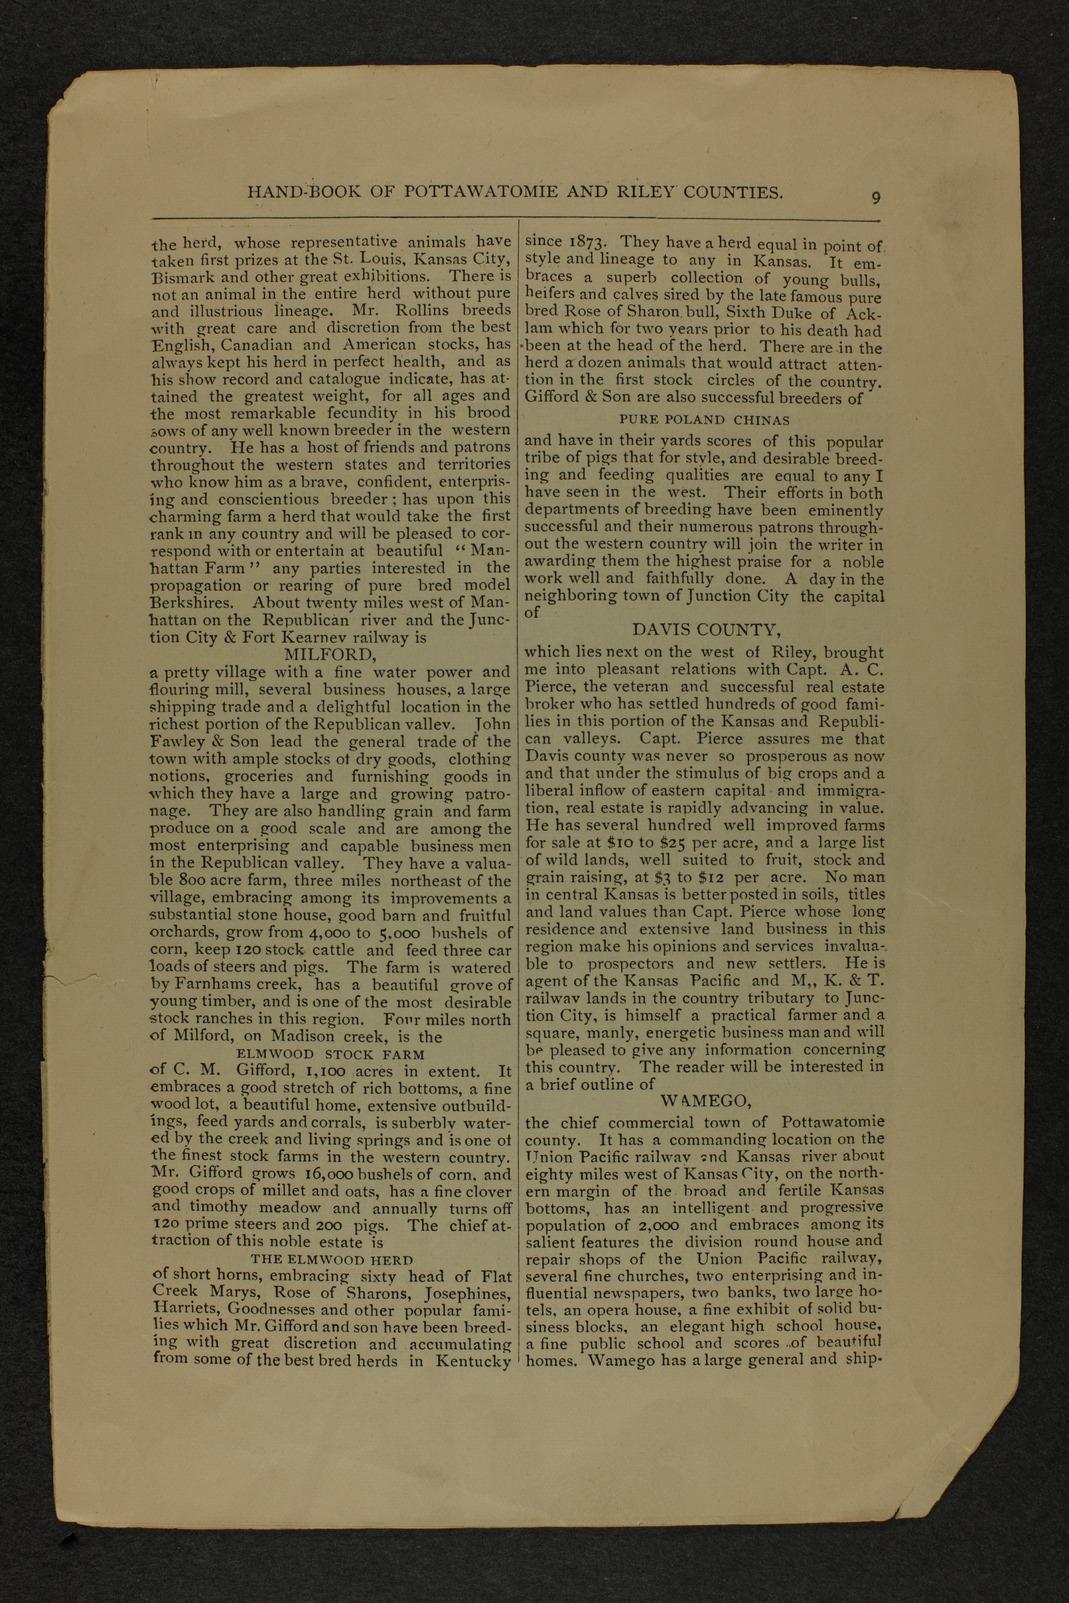 Handbook of Pottawatomie and Riley Counties, Kansas - page 9